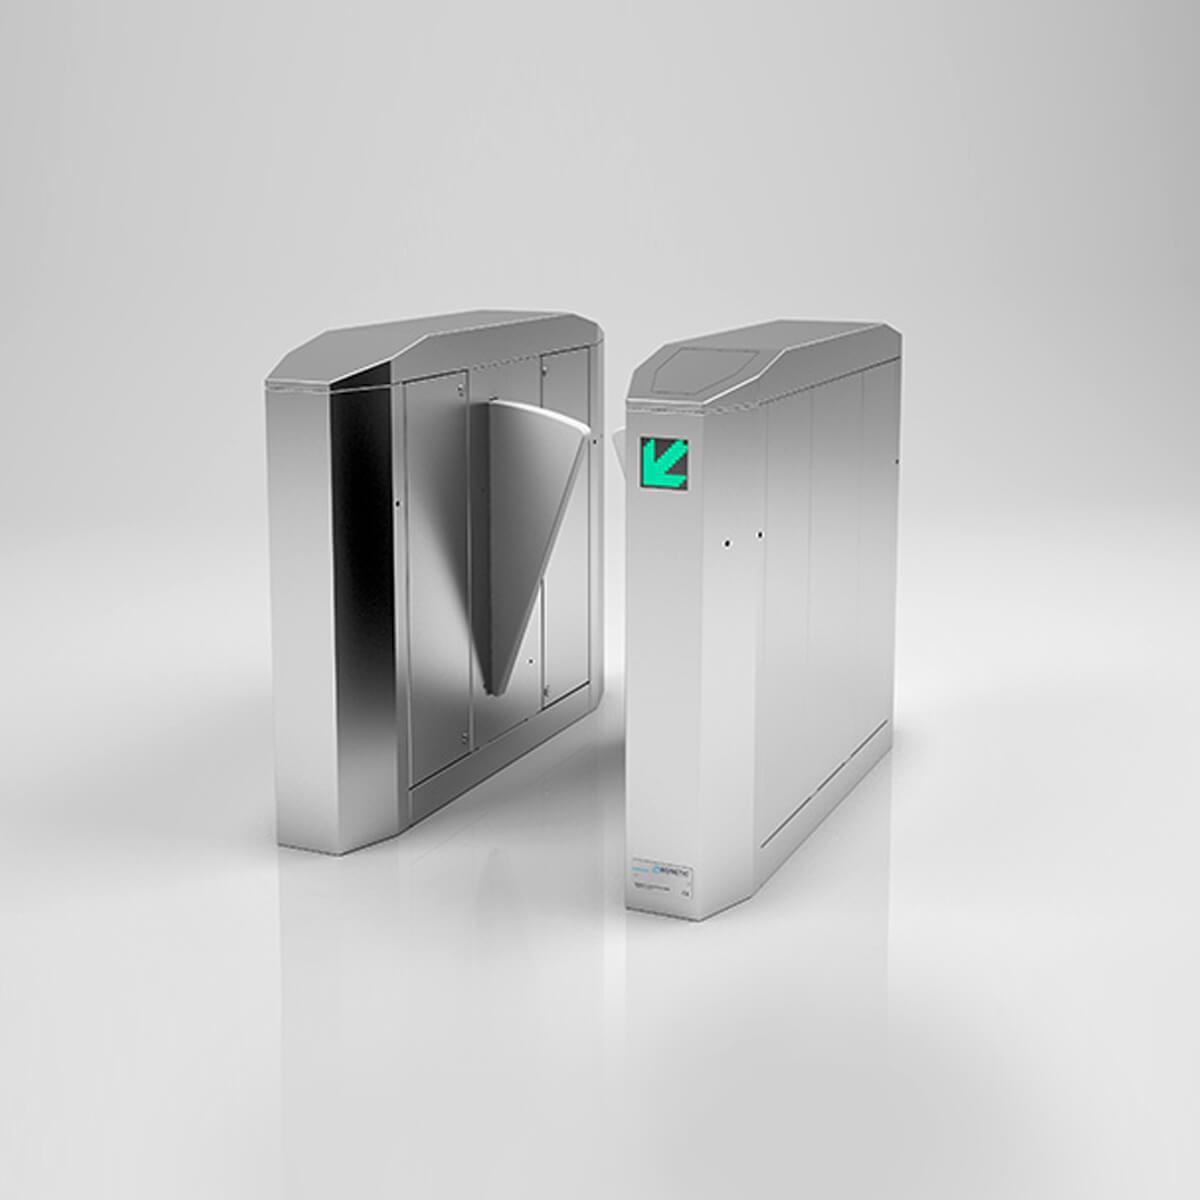 Buy Magnetic Access Control-MP MPR retractable gates in UAE, Qatar and Saudi Arabia